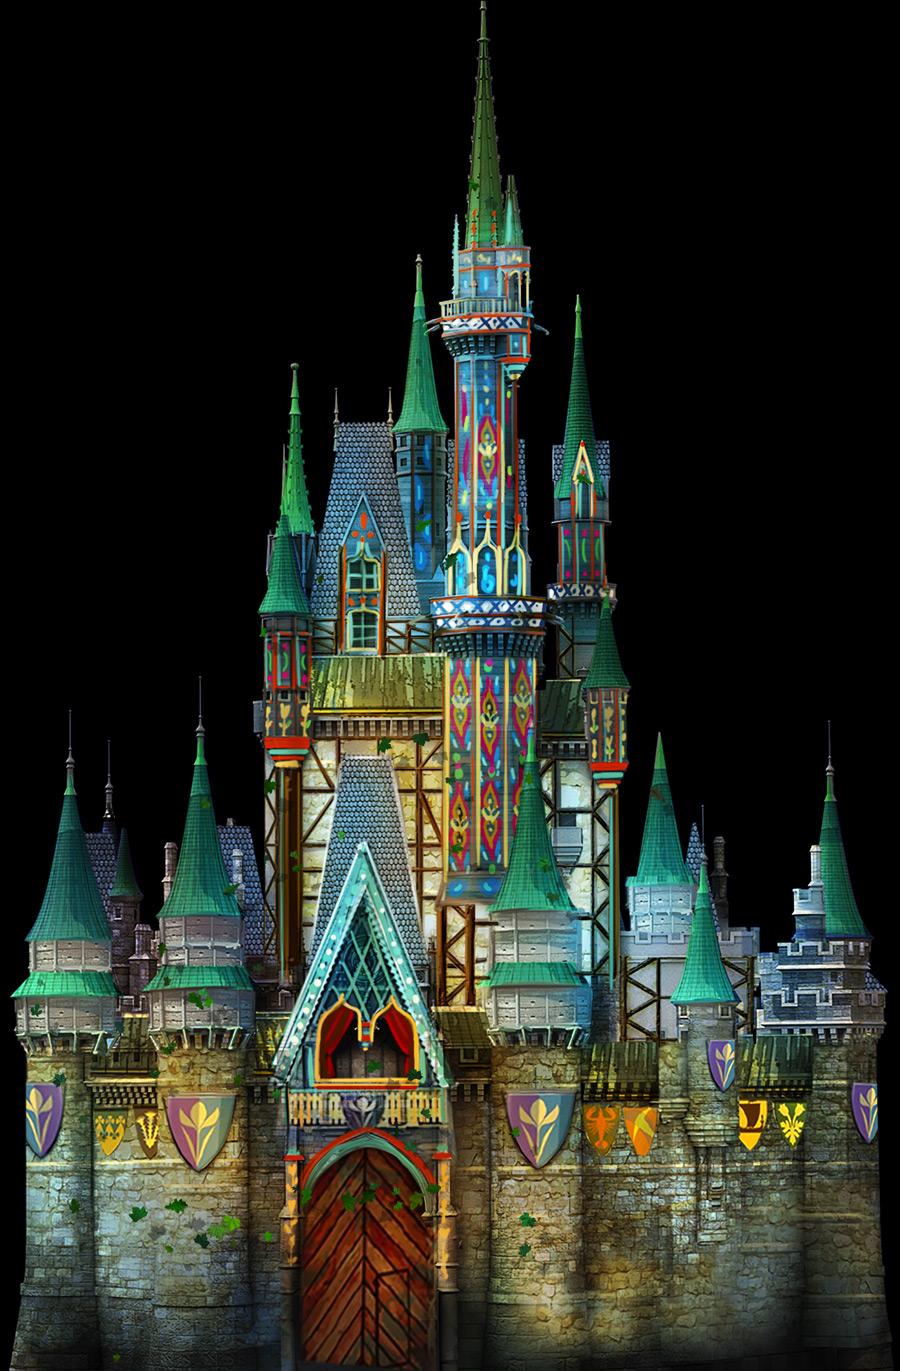 Cinderella Castle Tranforms into Arendelle